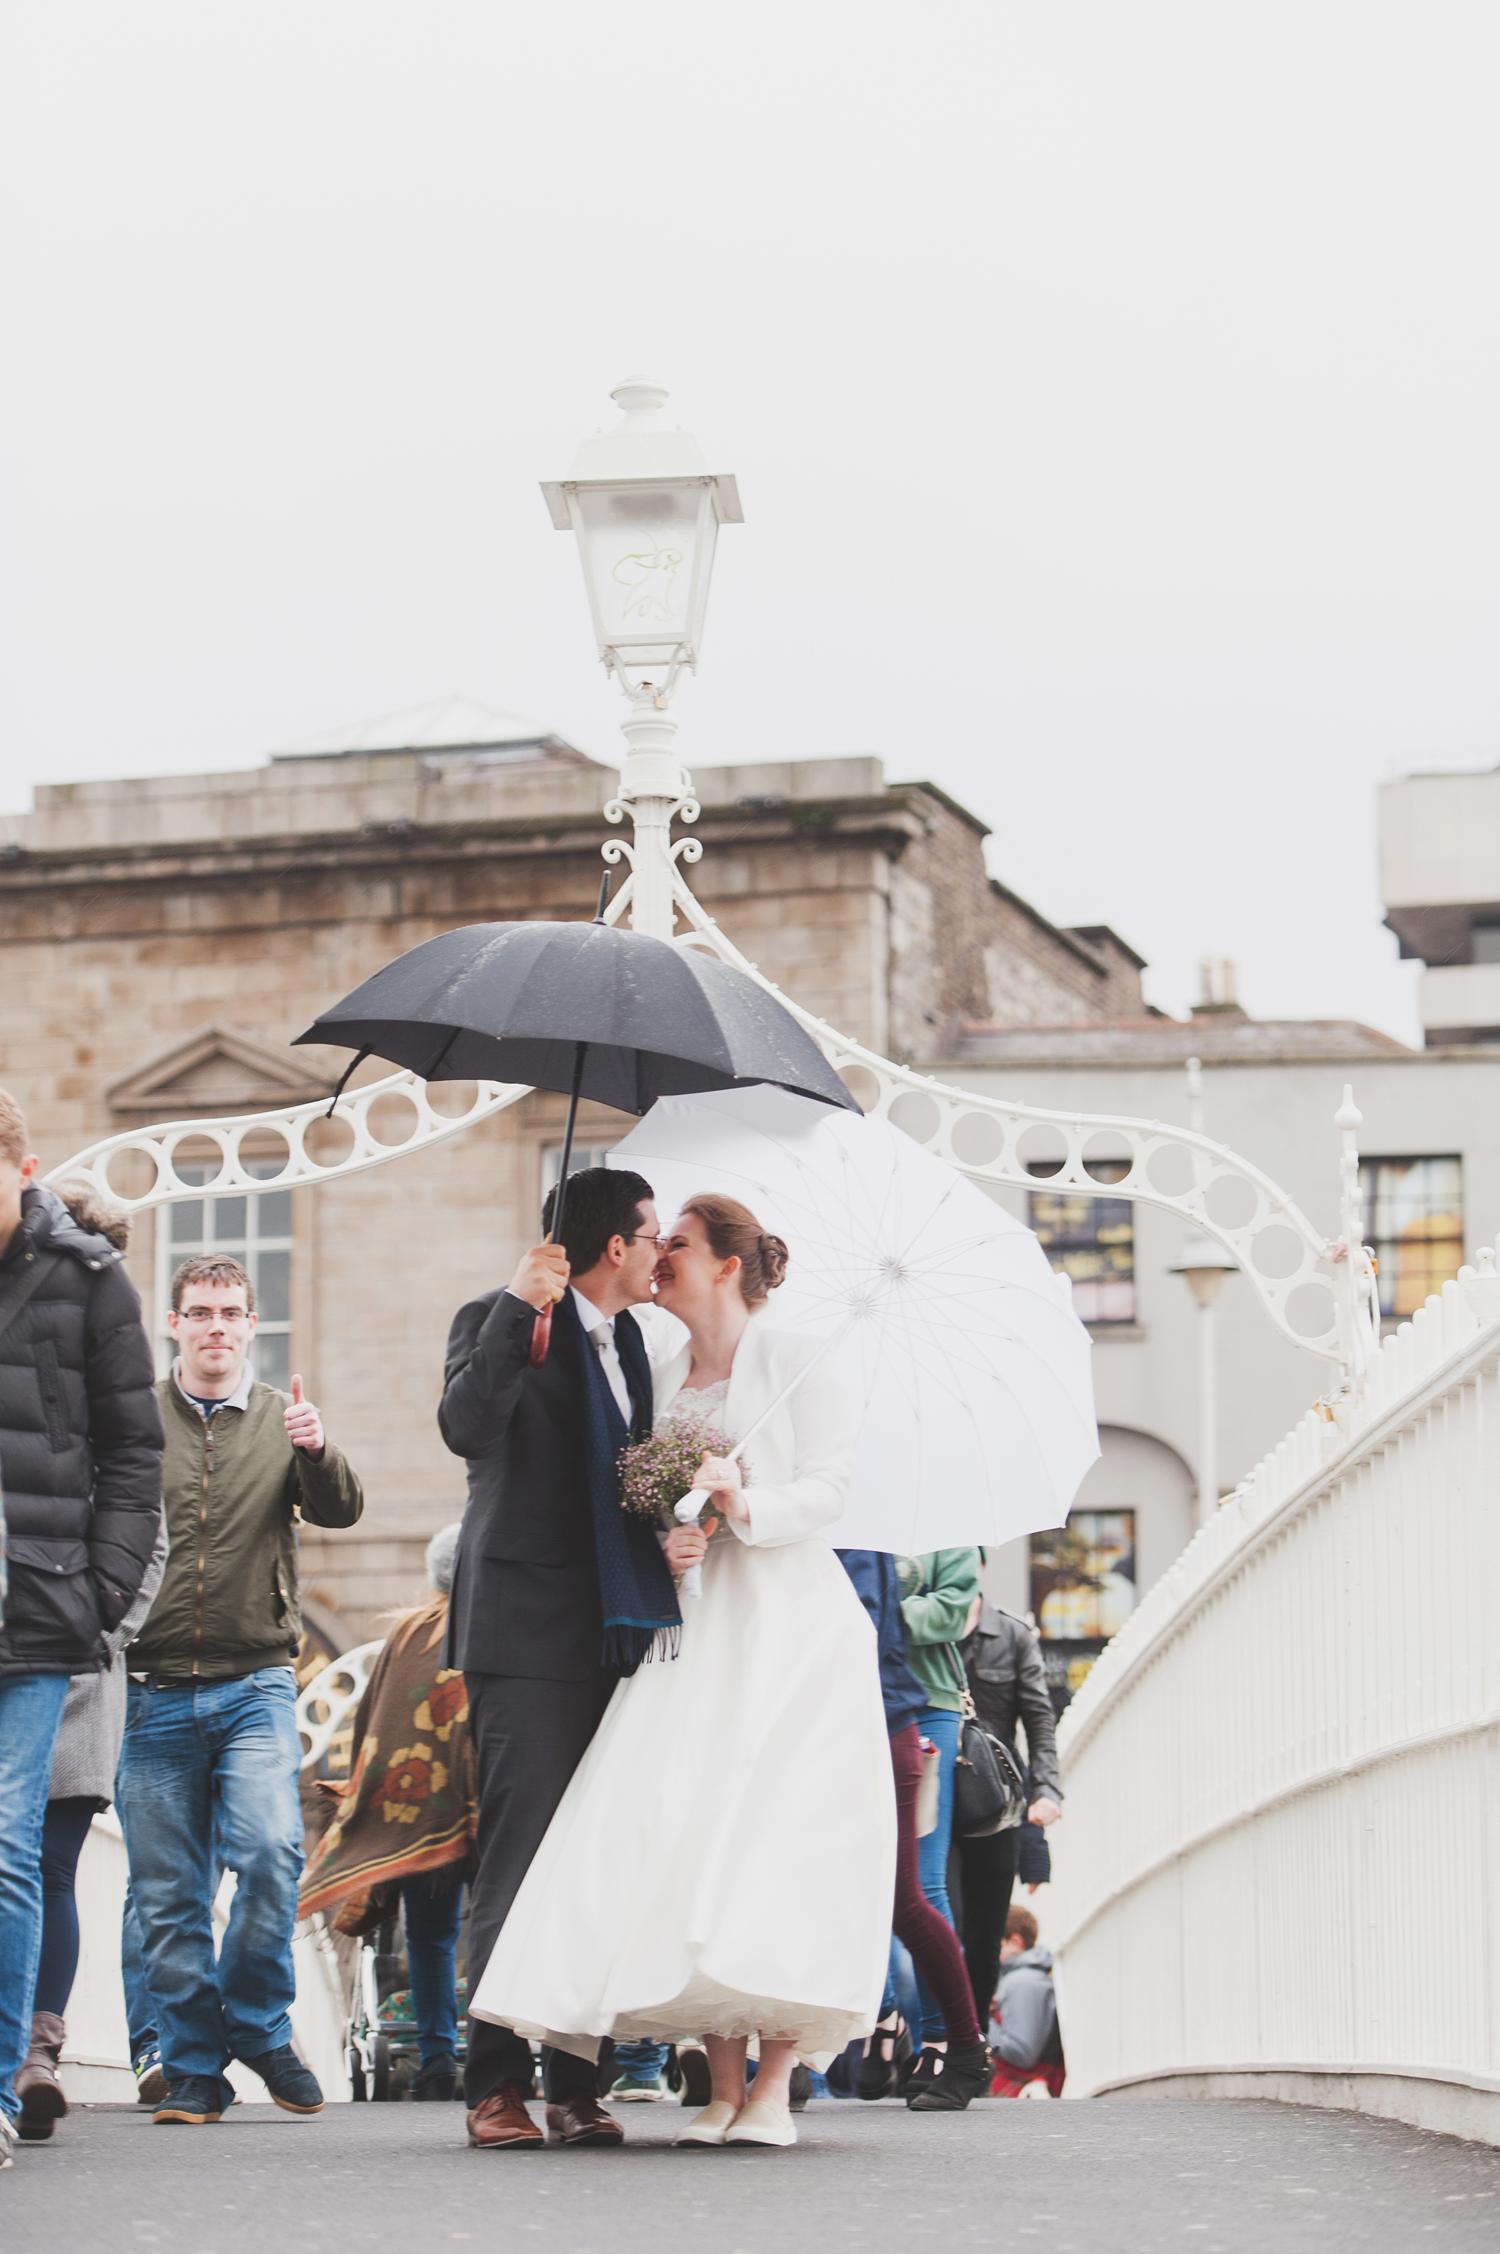 Wedding-in-Dublin-City-Centre-Morrison-Hotel-Wedding-Photography-Dublin-Stylish-City-Wedding261.jpg